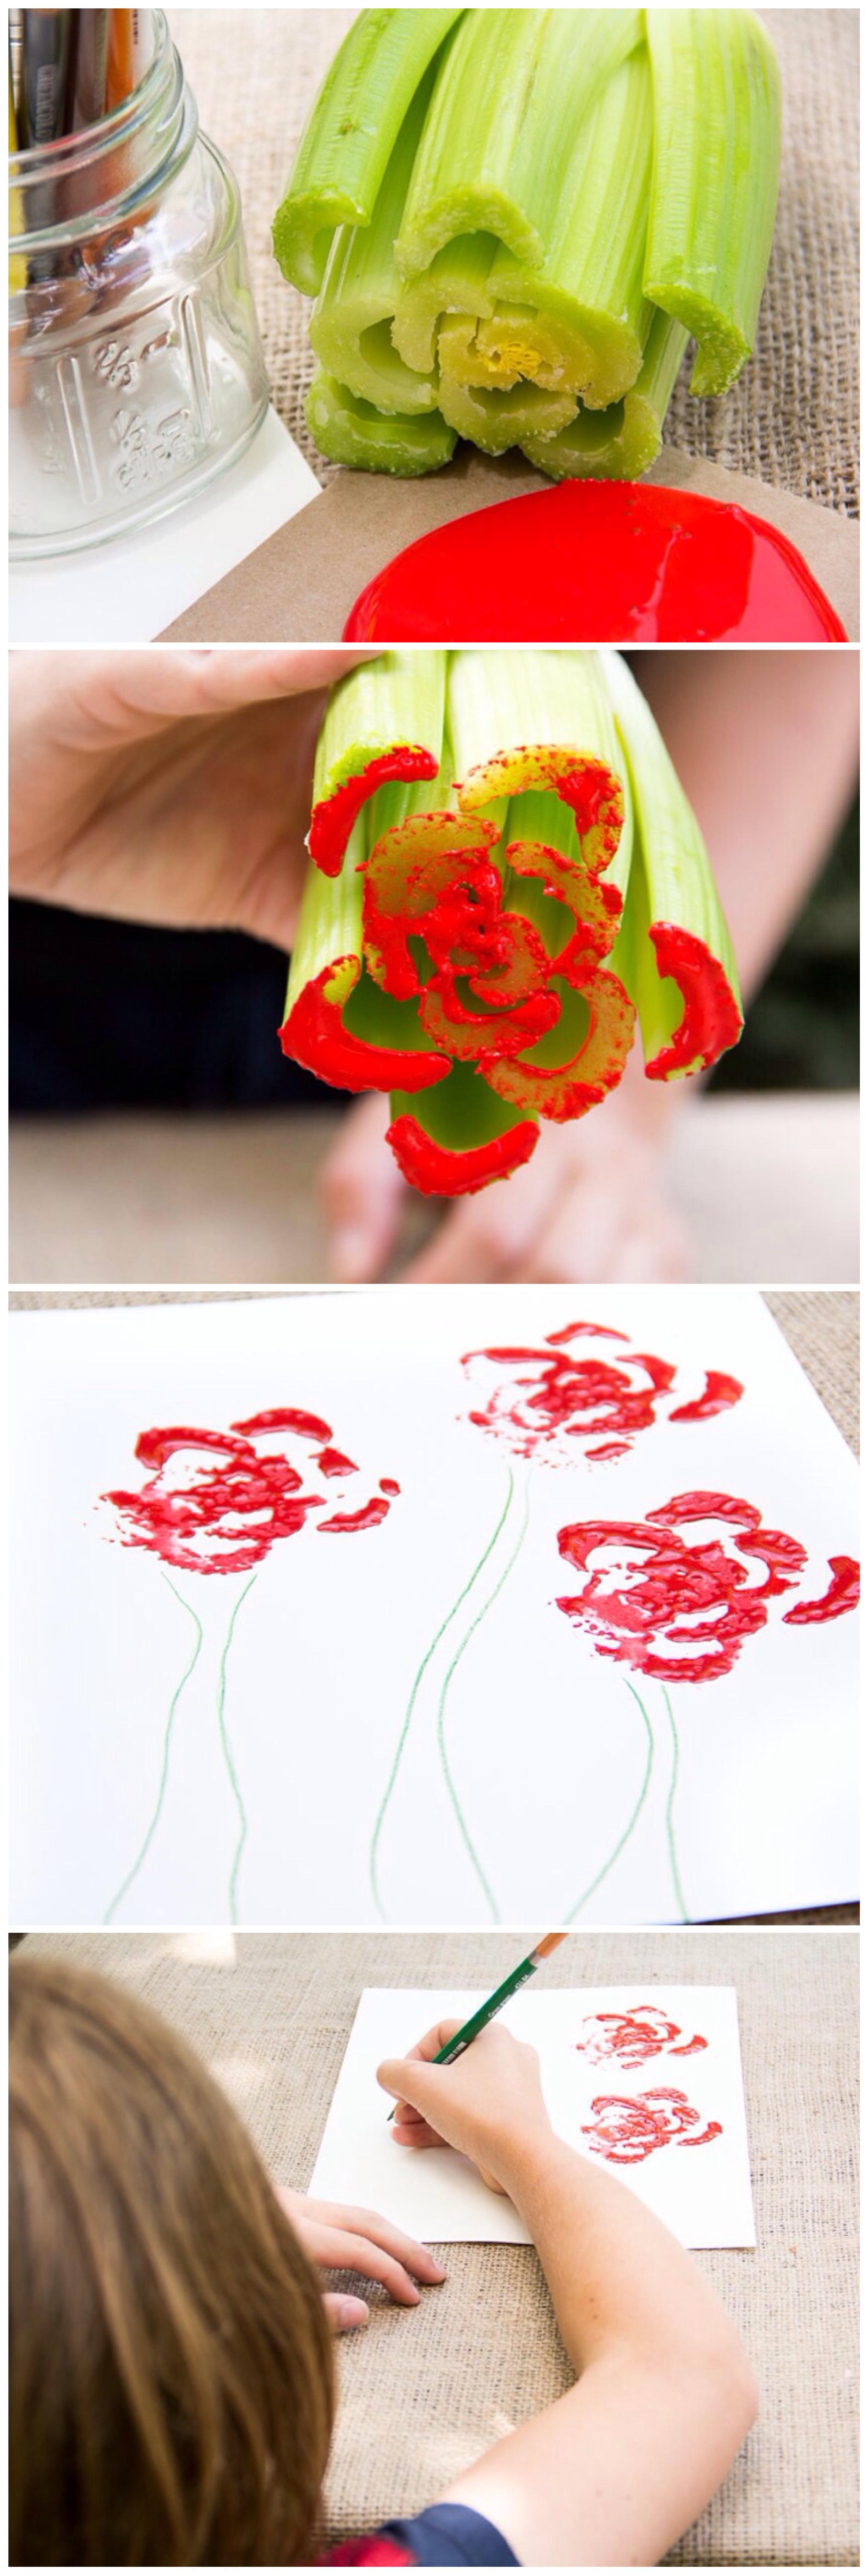 Diy celery painting moonfrye paint crafts repurposed kids crafts